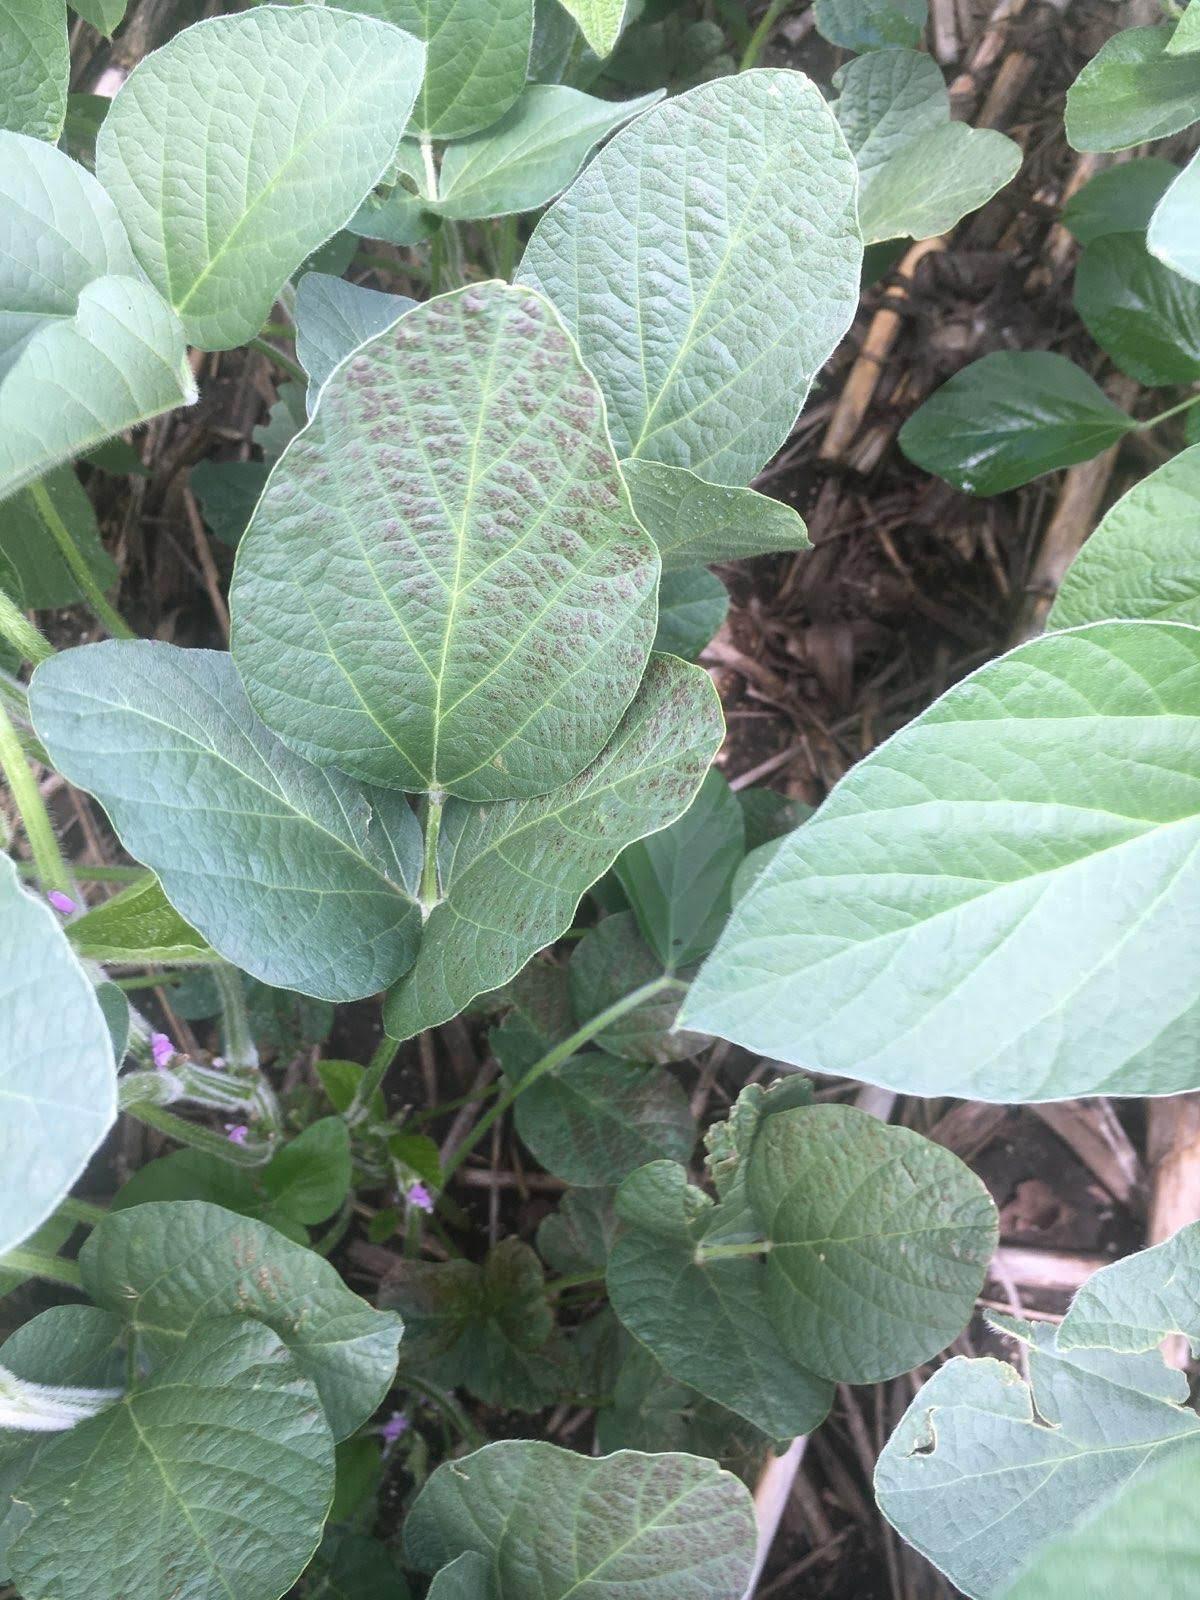 Cercospora leaf blight